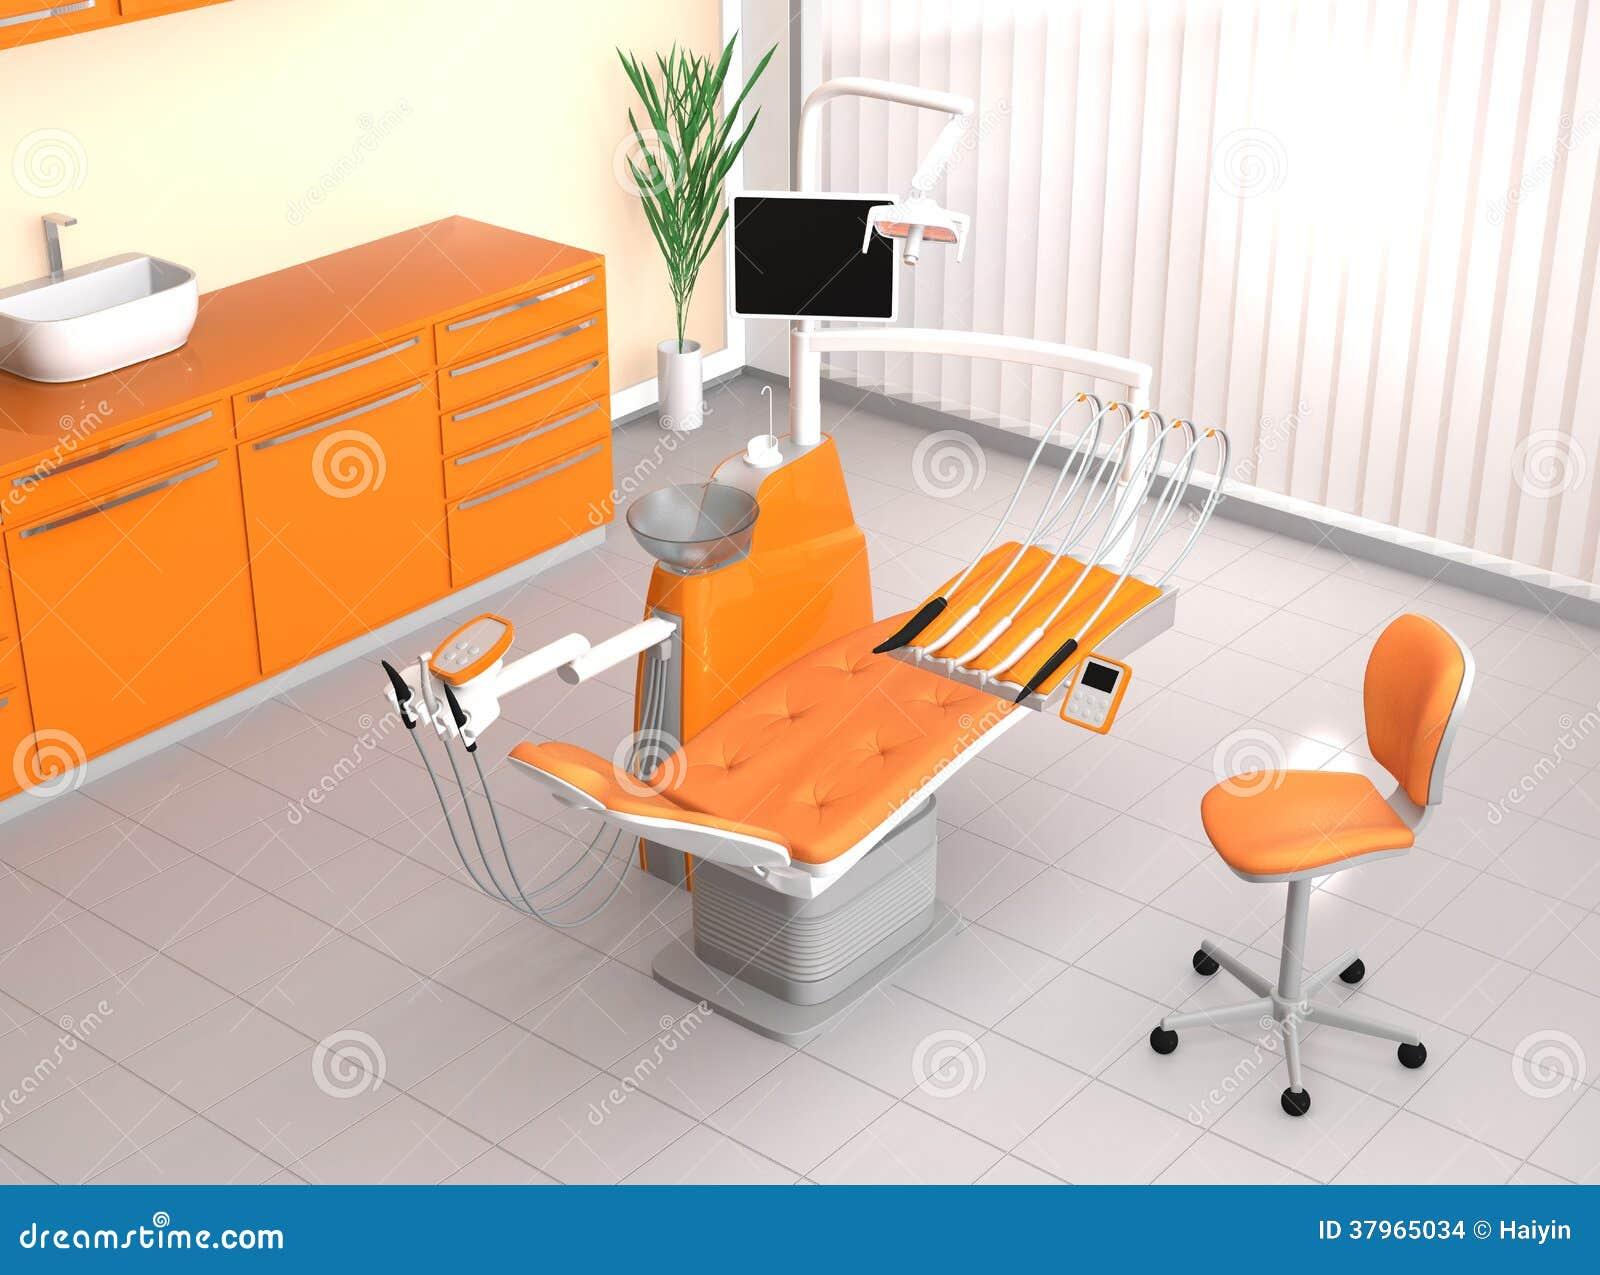 Modern dental office interior stock illustration image for Contemporary theme in interior design